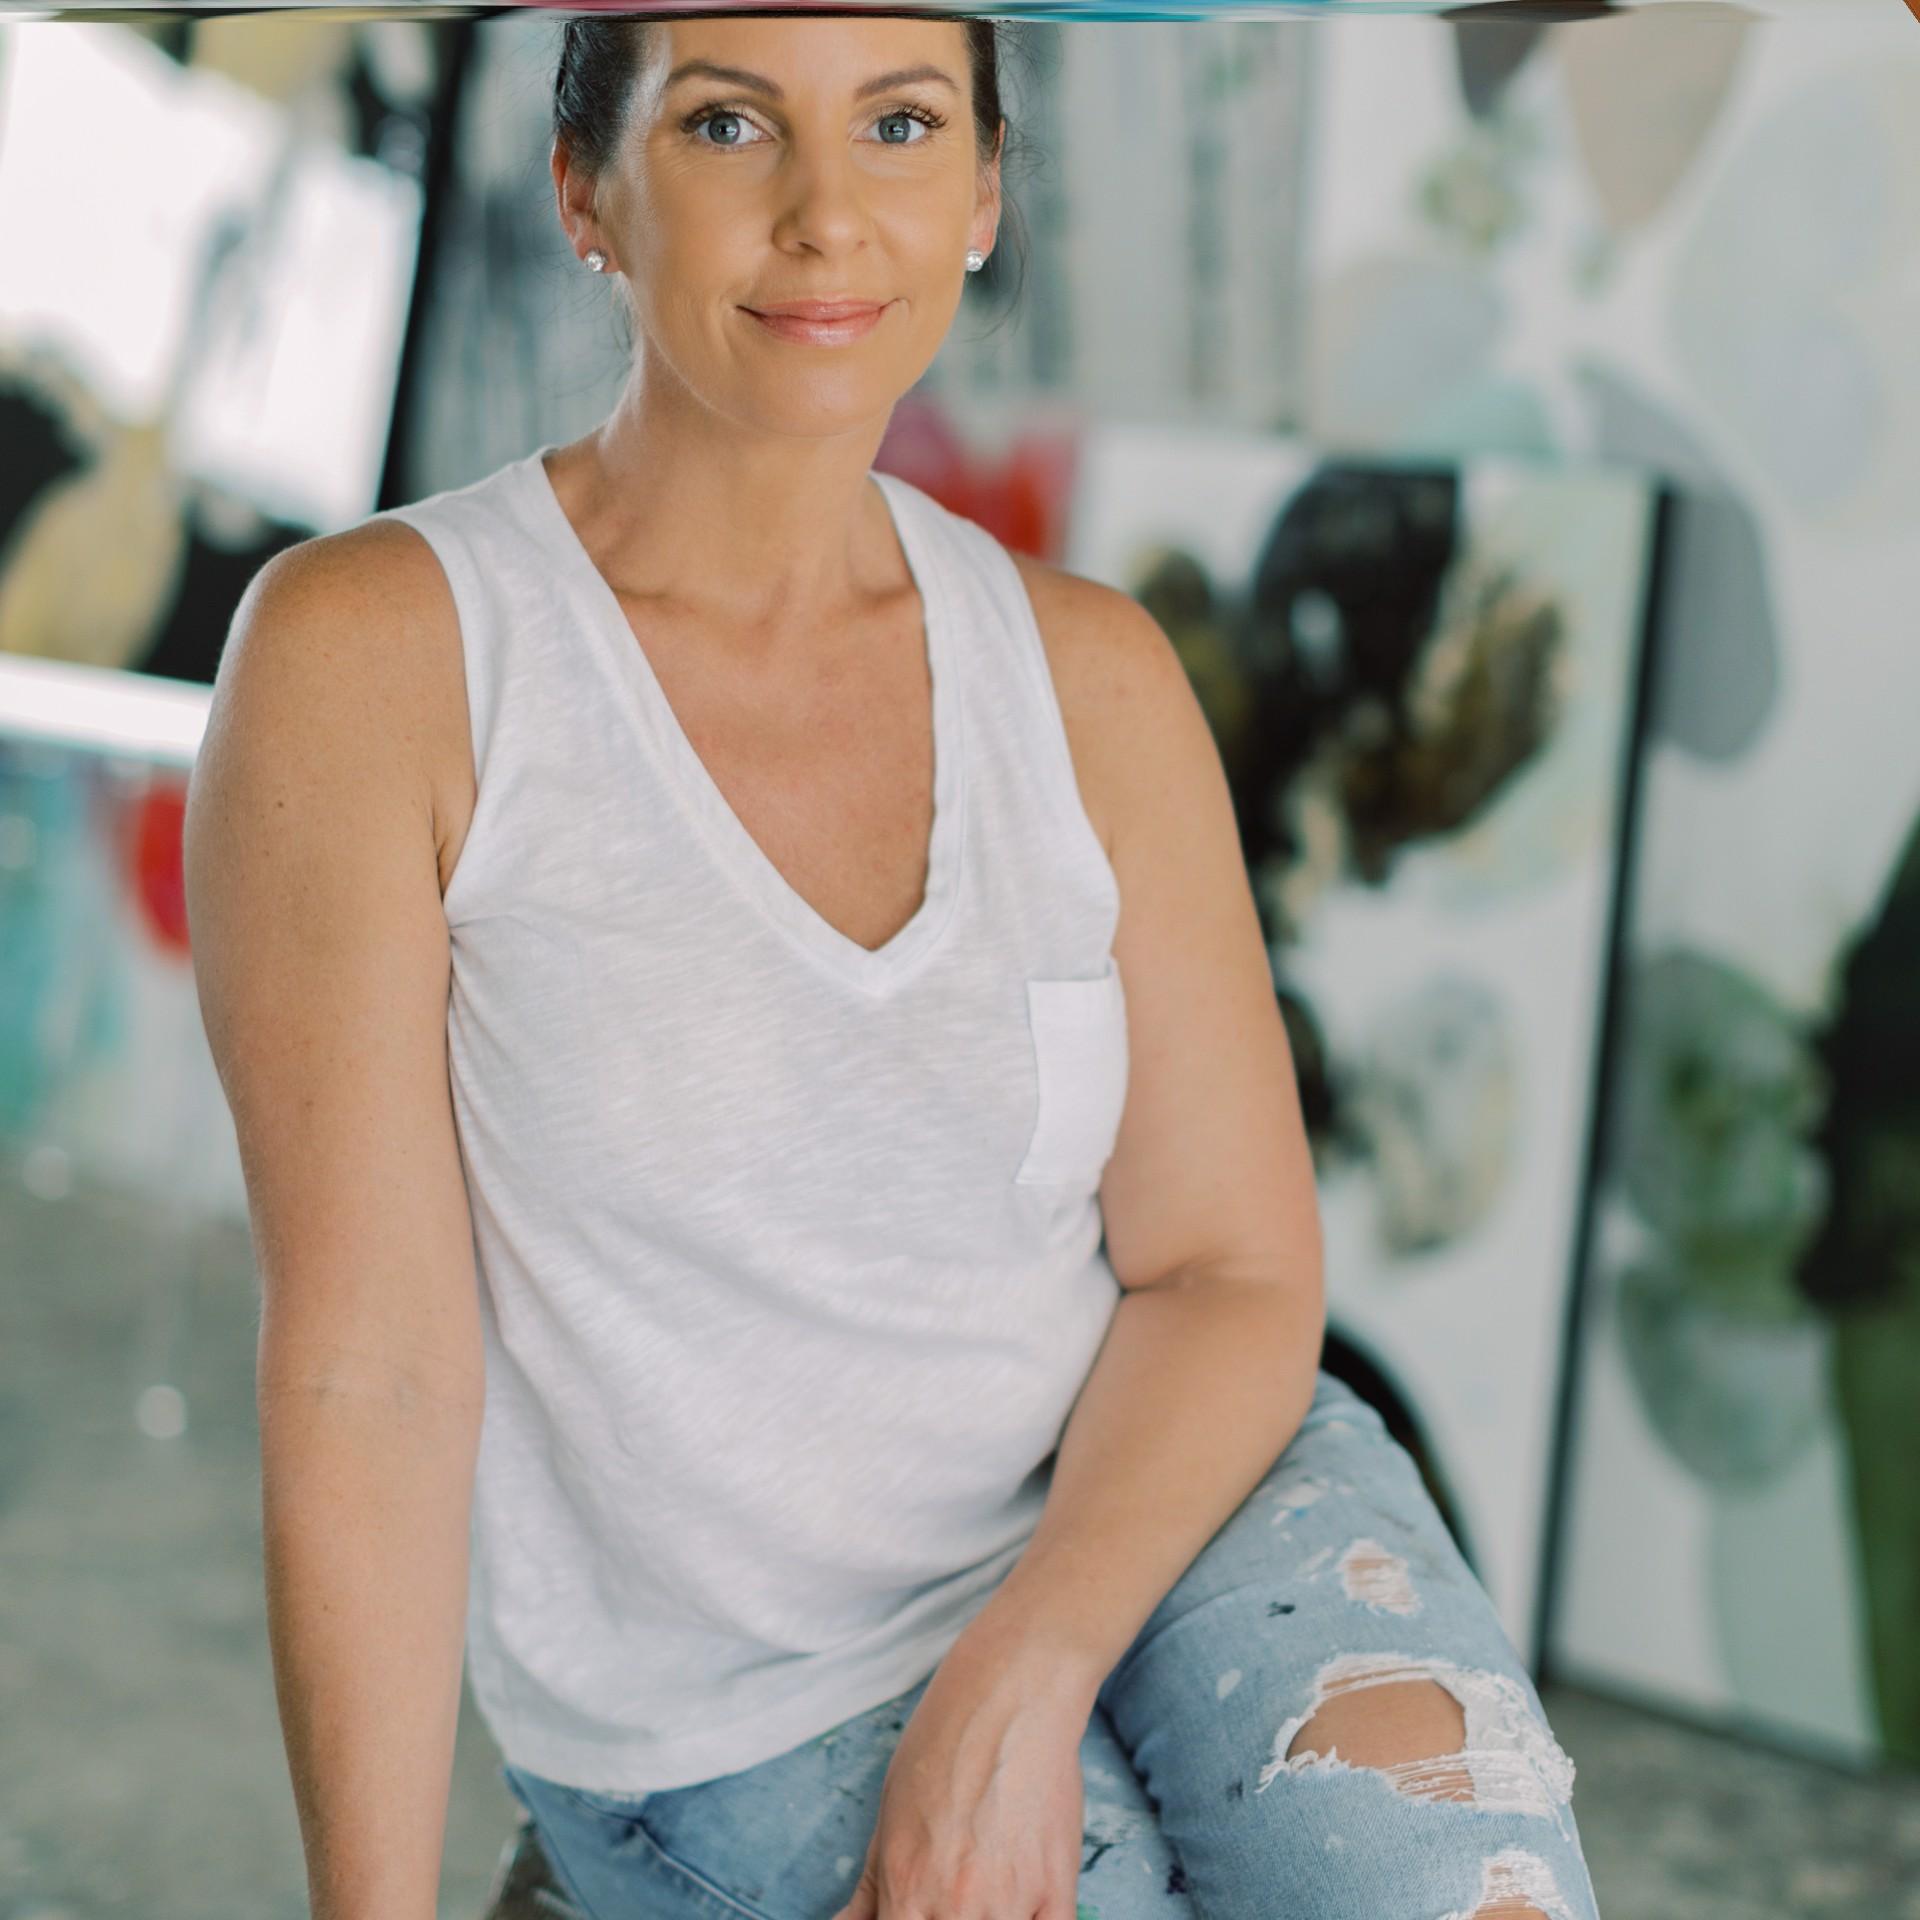 Meredith Pardue